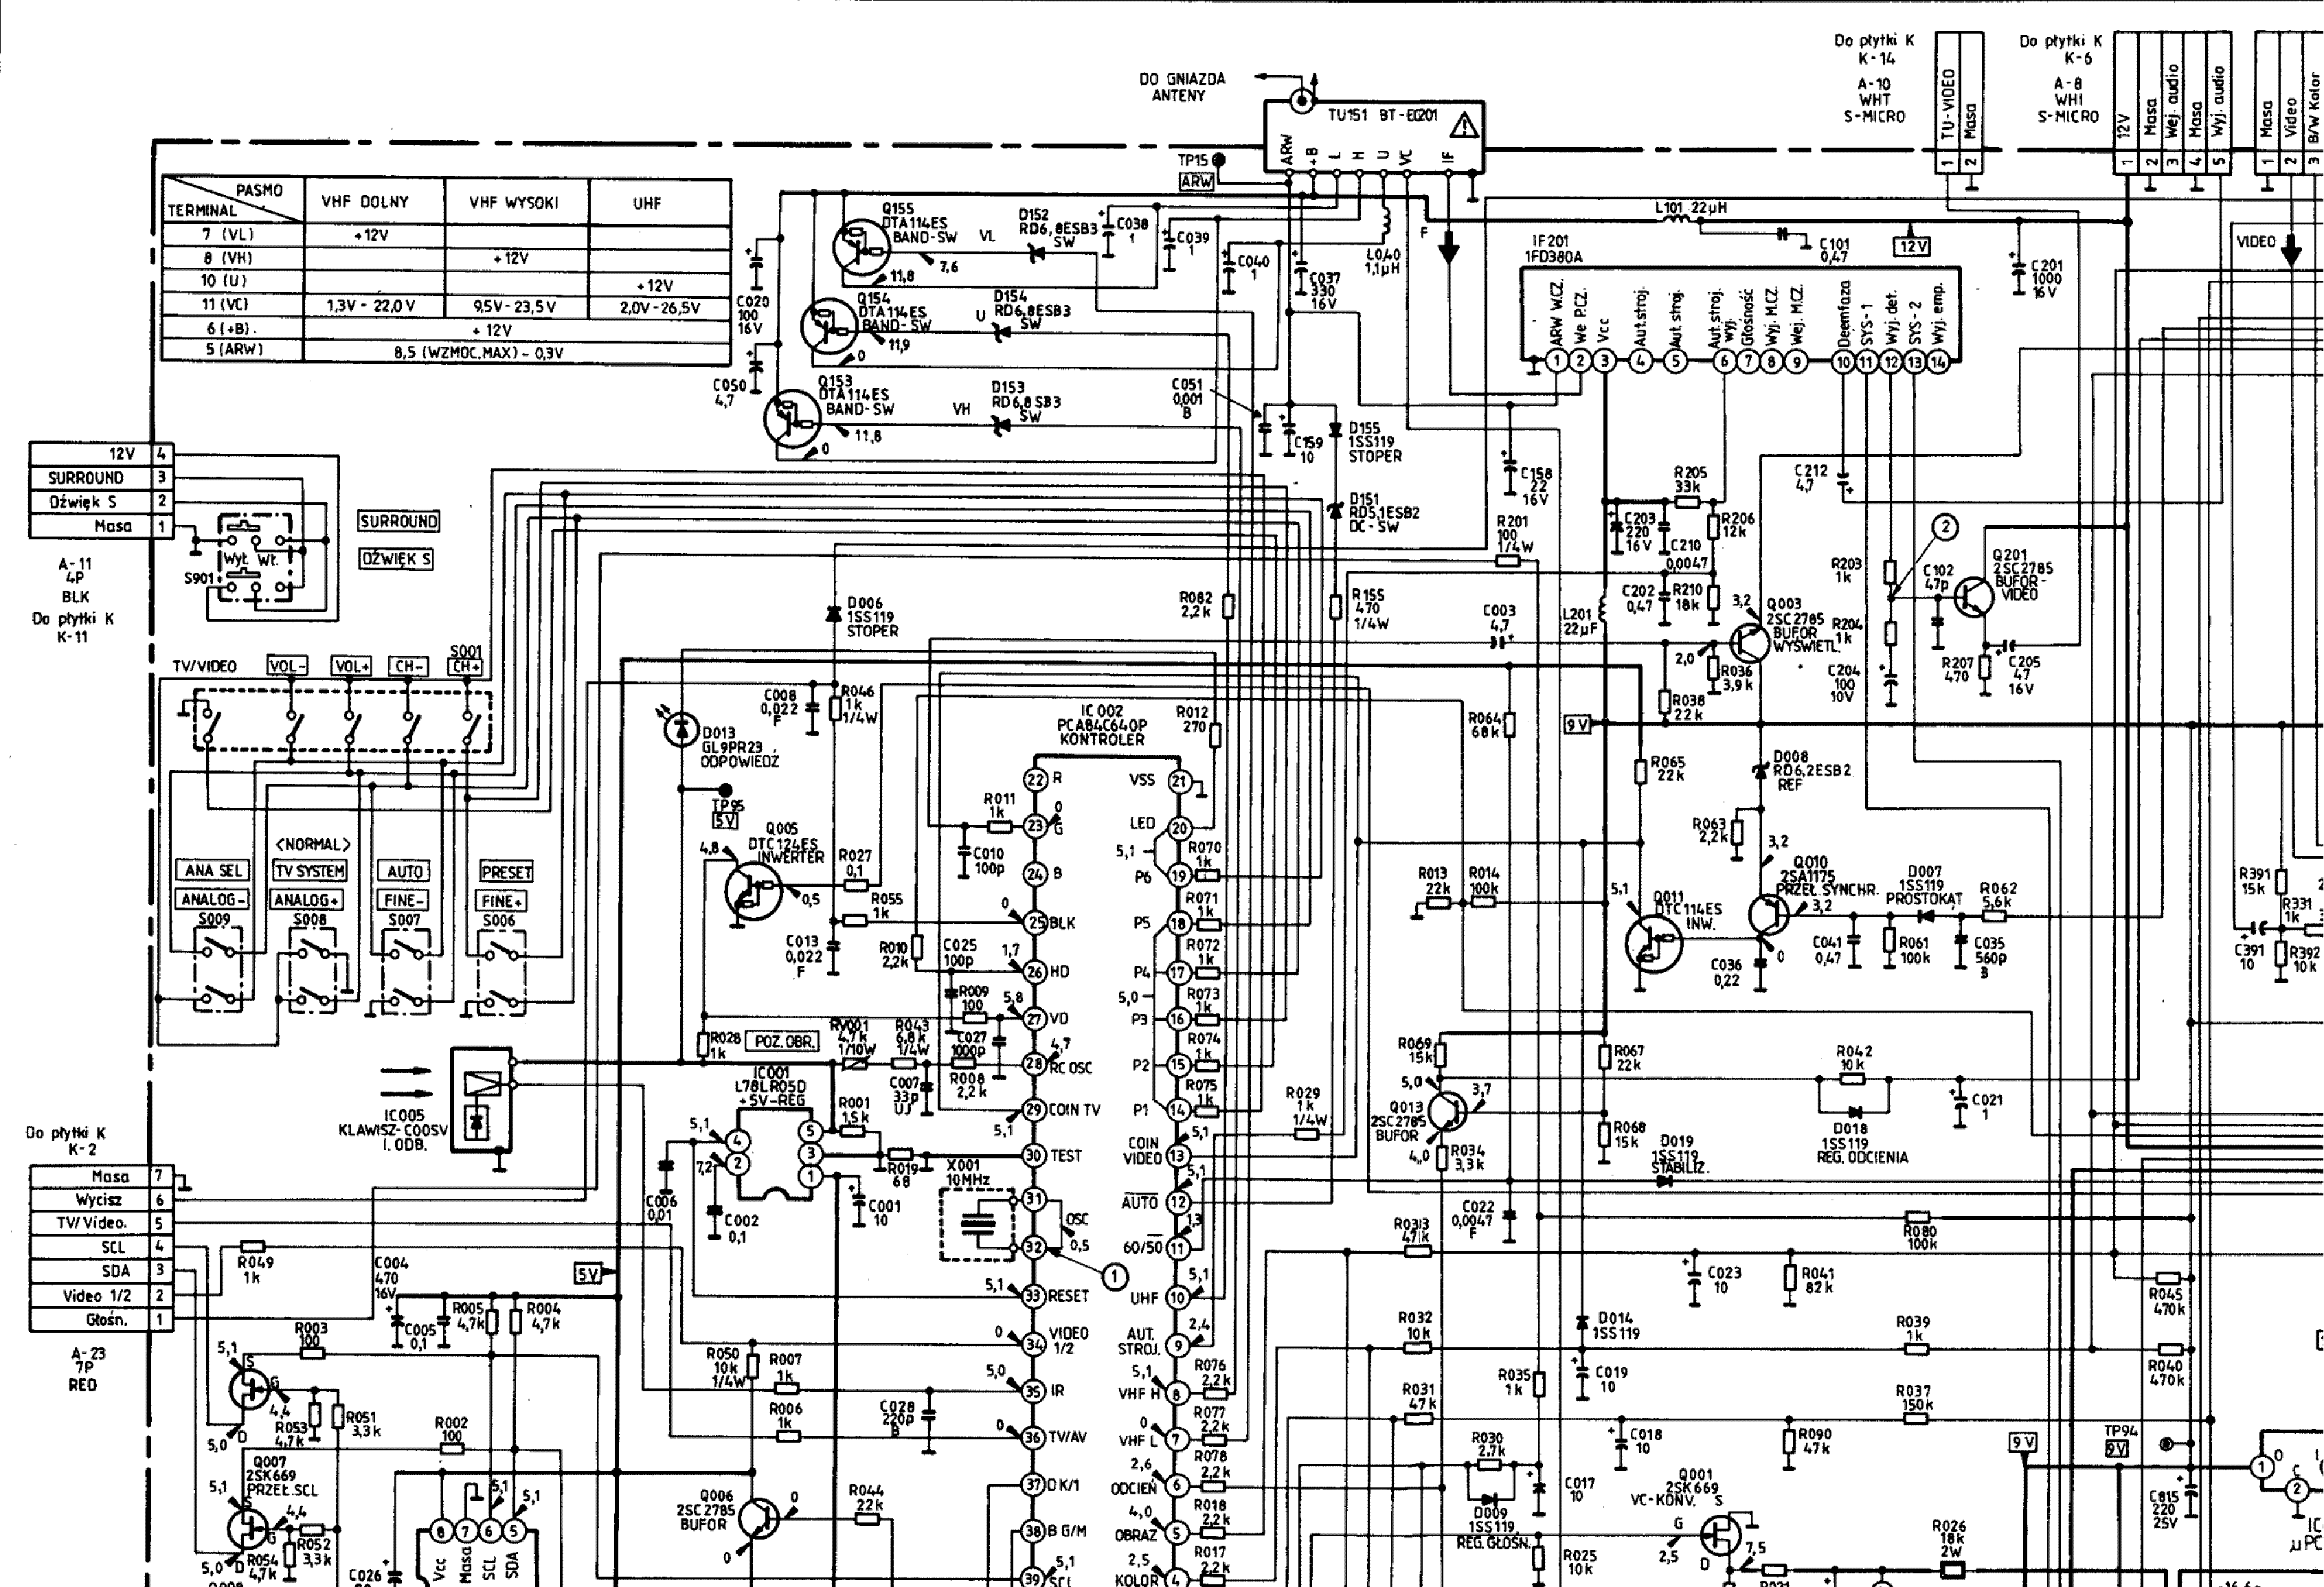 t v circuit diagram free download wiring diagram pagesansui tv circuit diagram free download circuit diagram images [ 3383 x 2310 Pixel ]